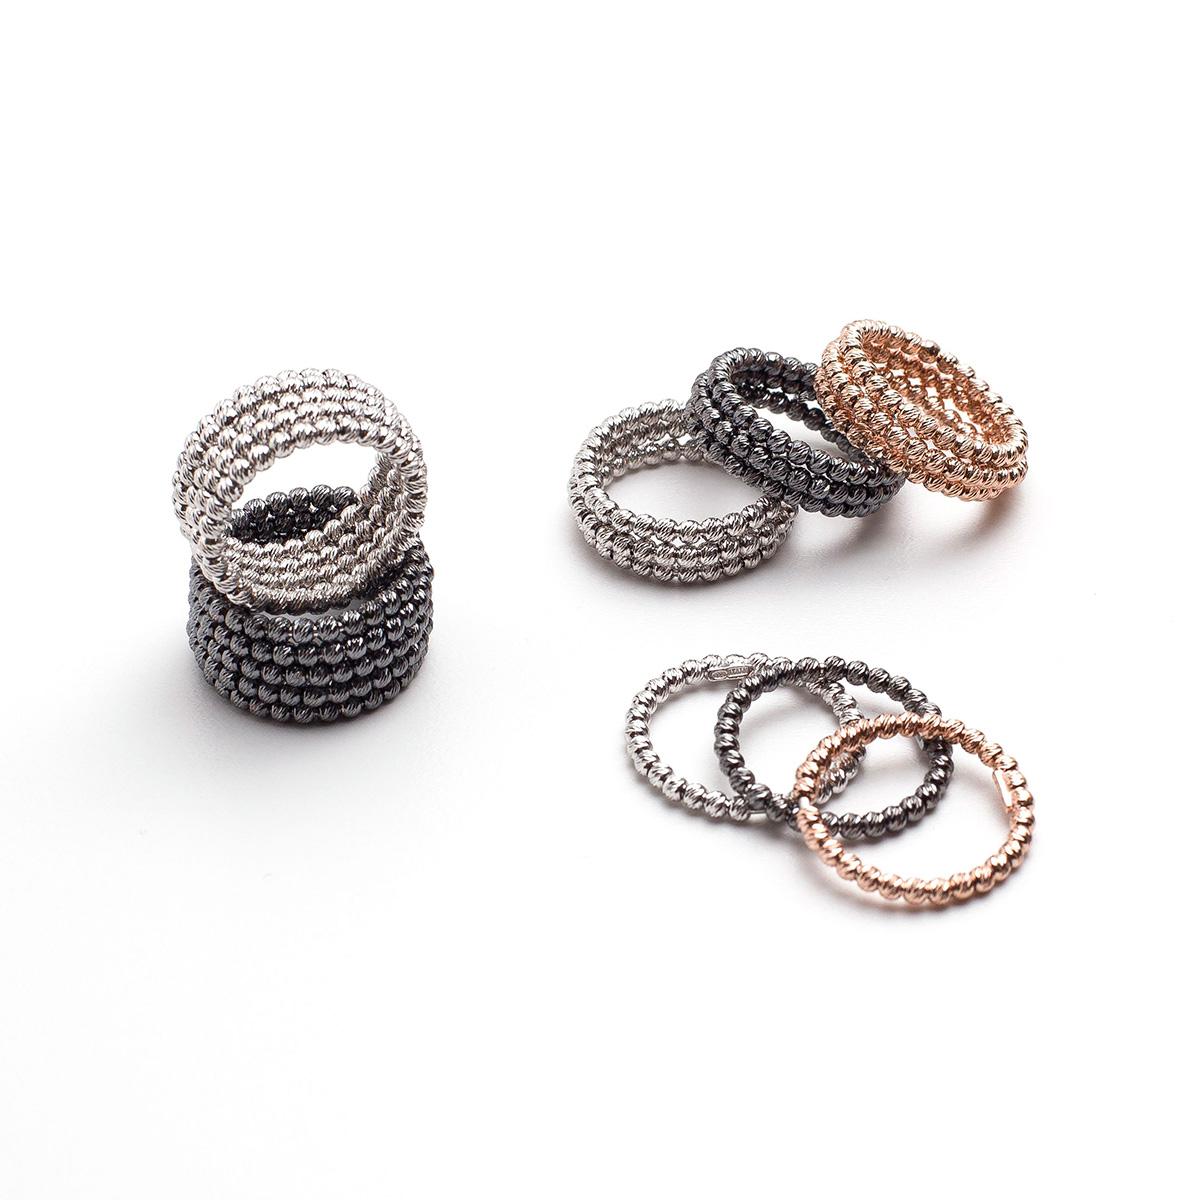 Linea Italia - italian collection handmade rings